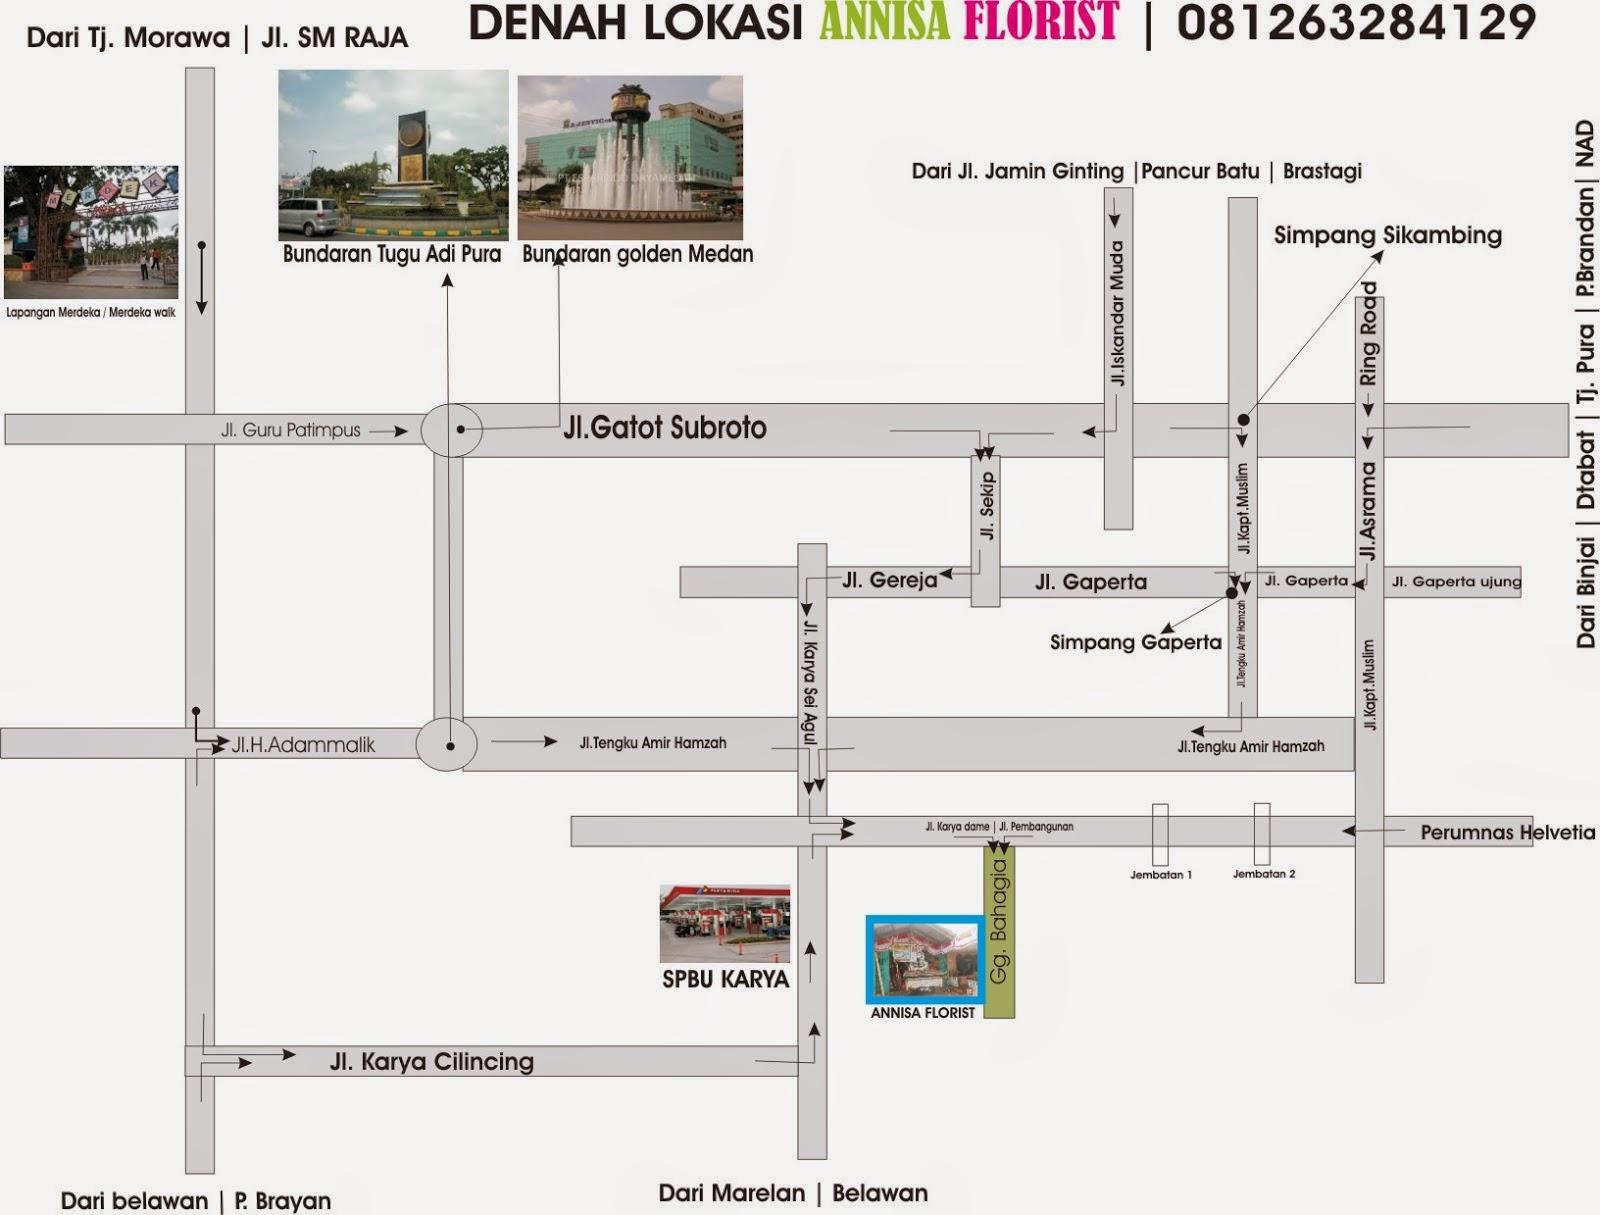 DENAH LOKASI ANNISA FLORIST | 081263284129